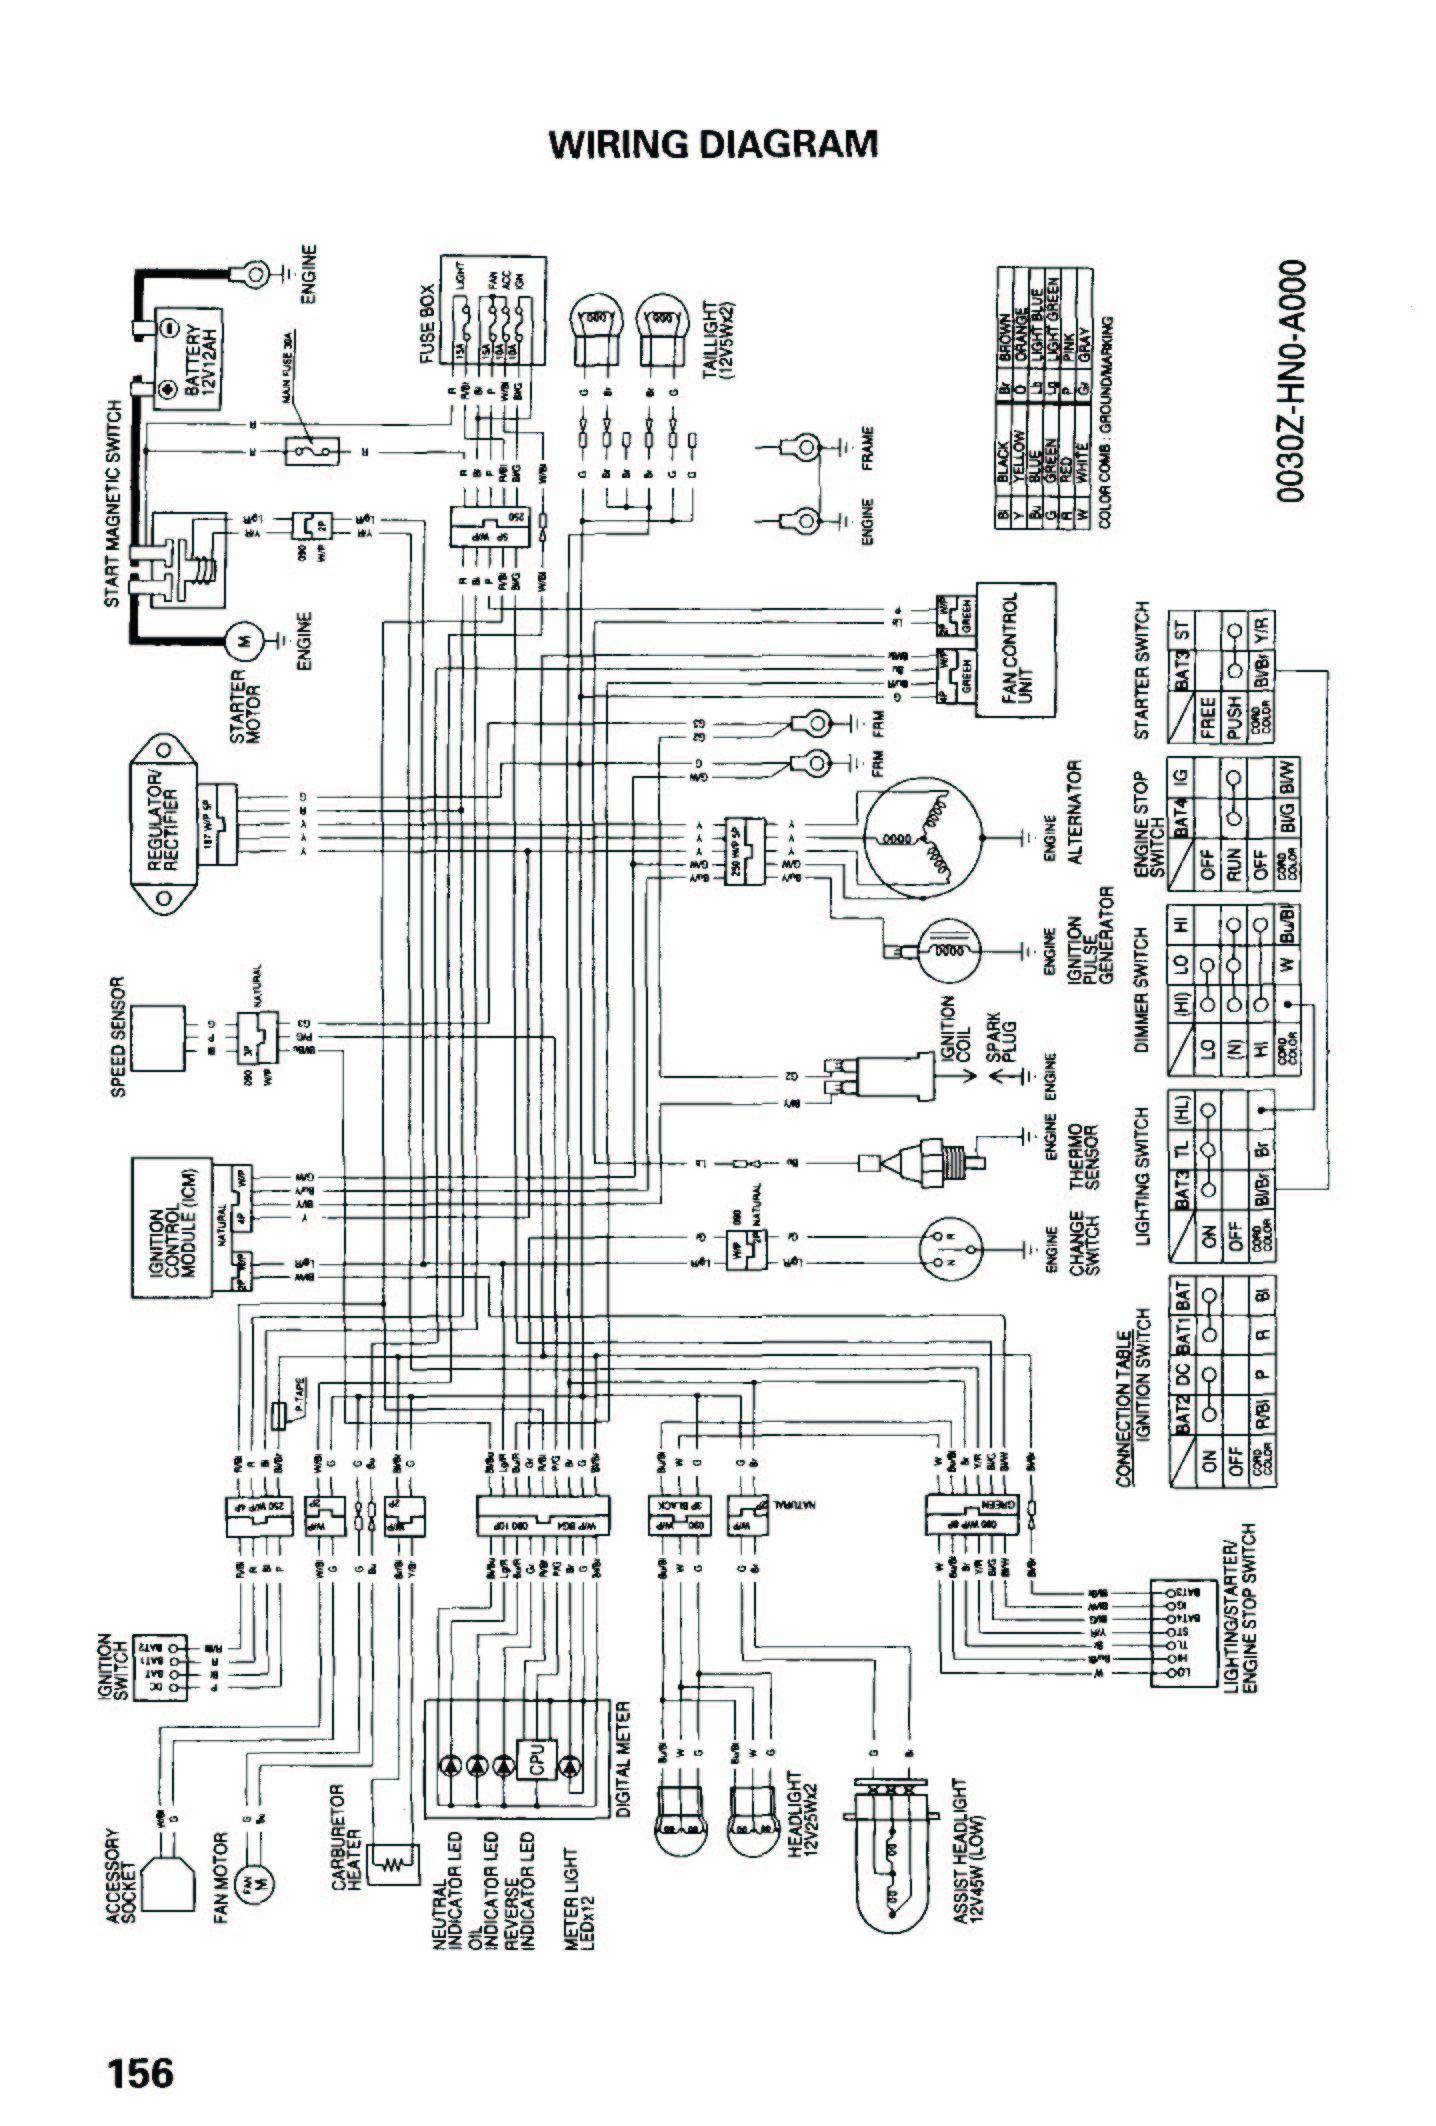 Wire Diagram On A Honda Trx 90